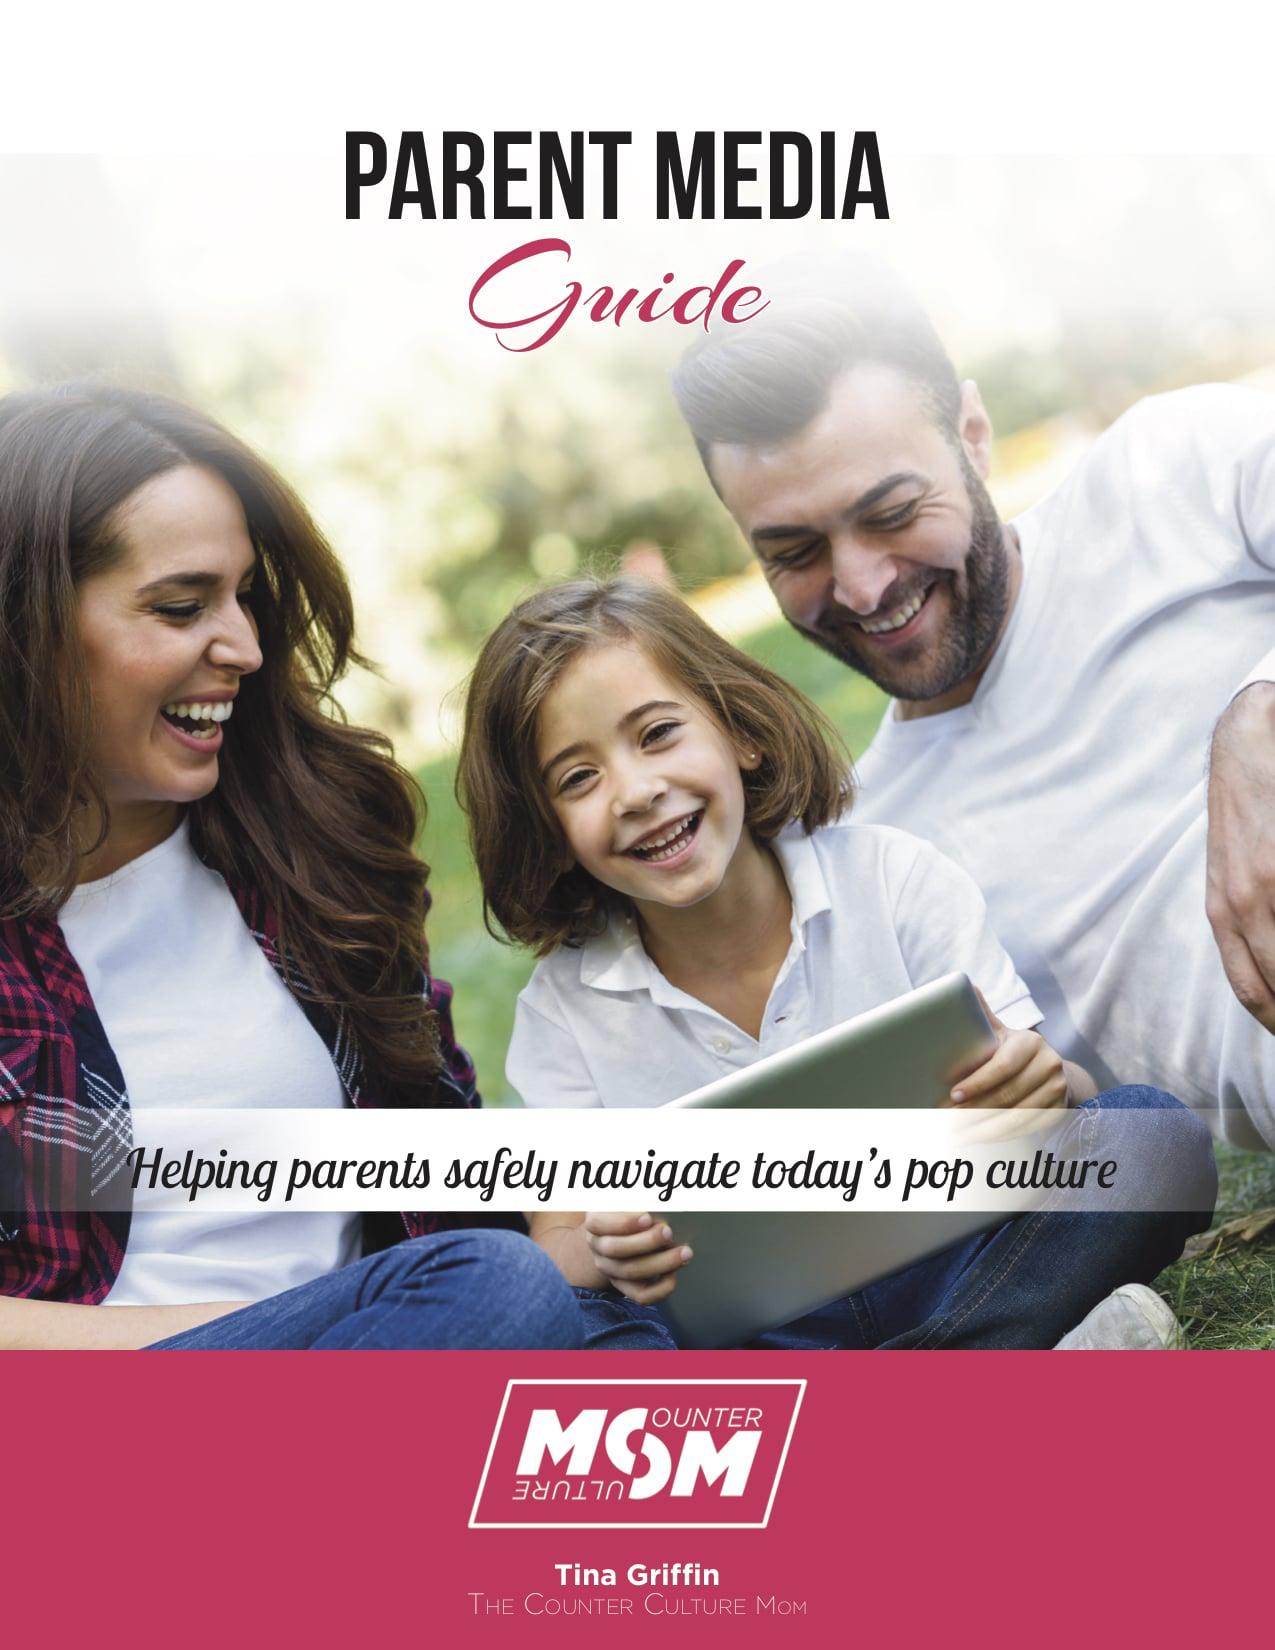 Parent media guide